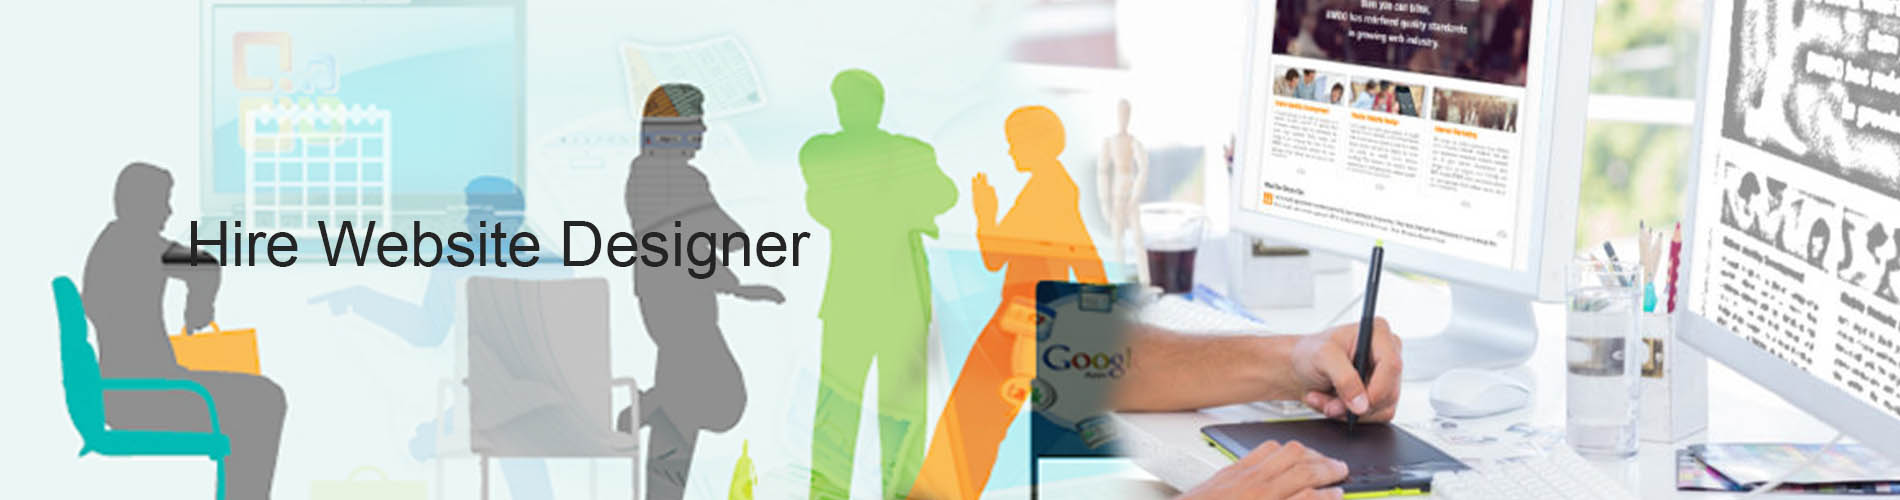 hire-website-designer